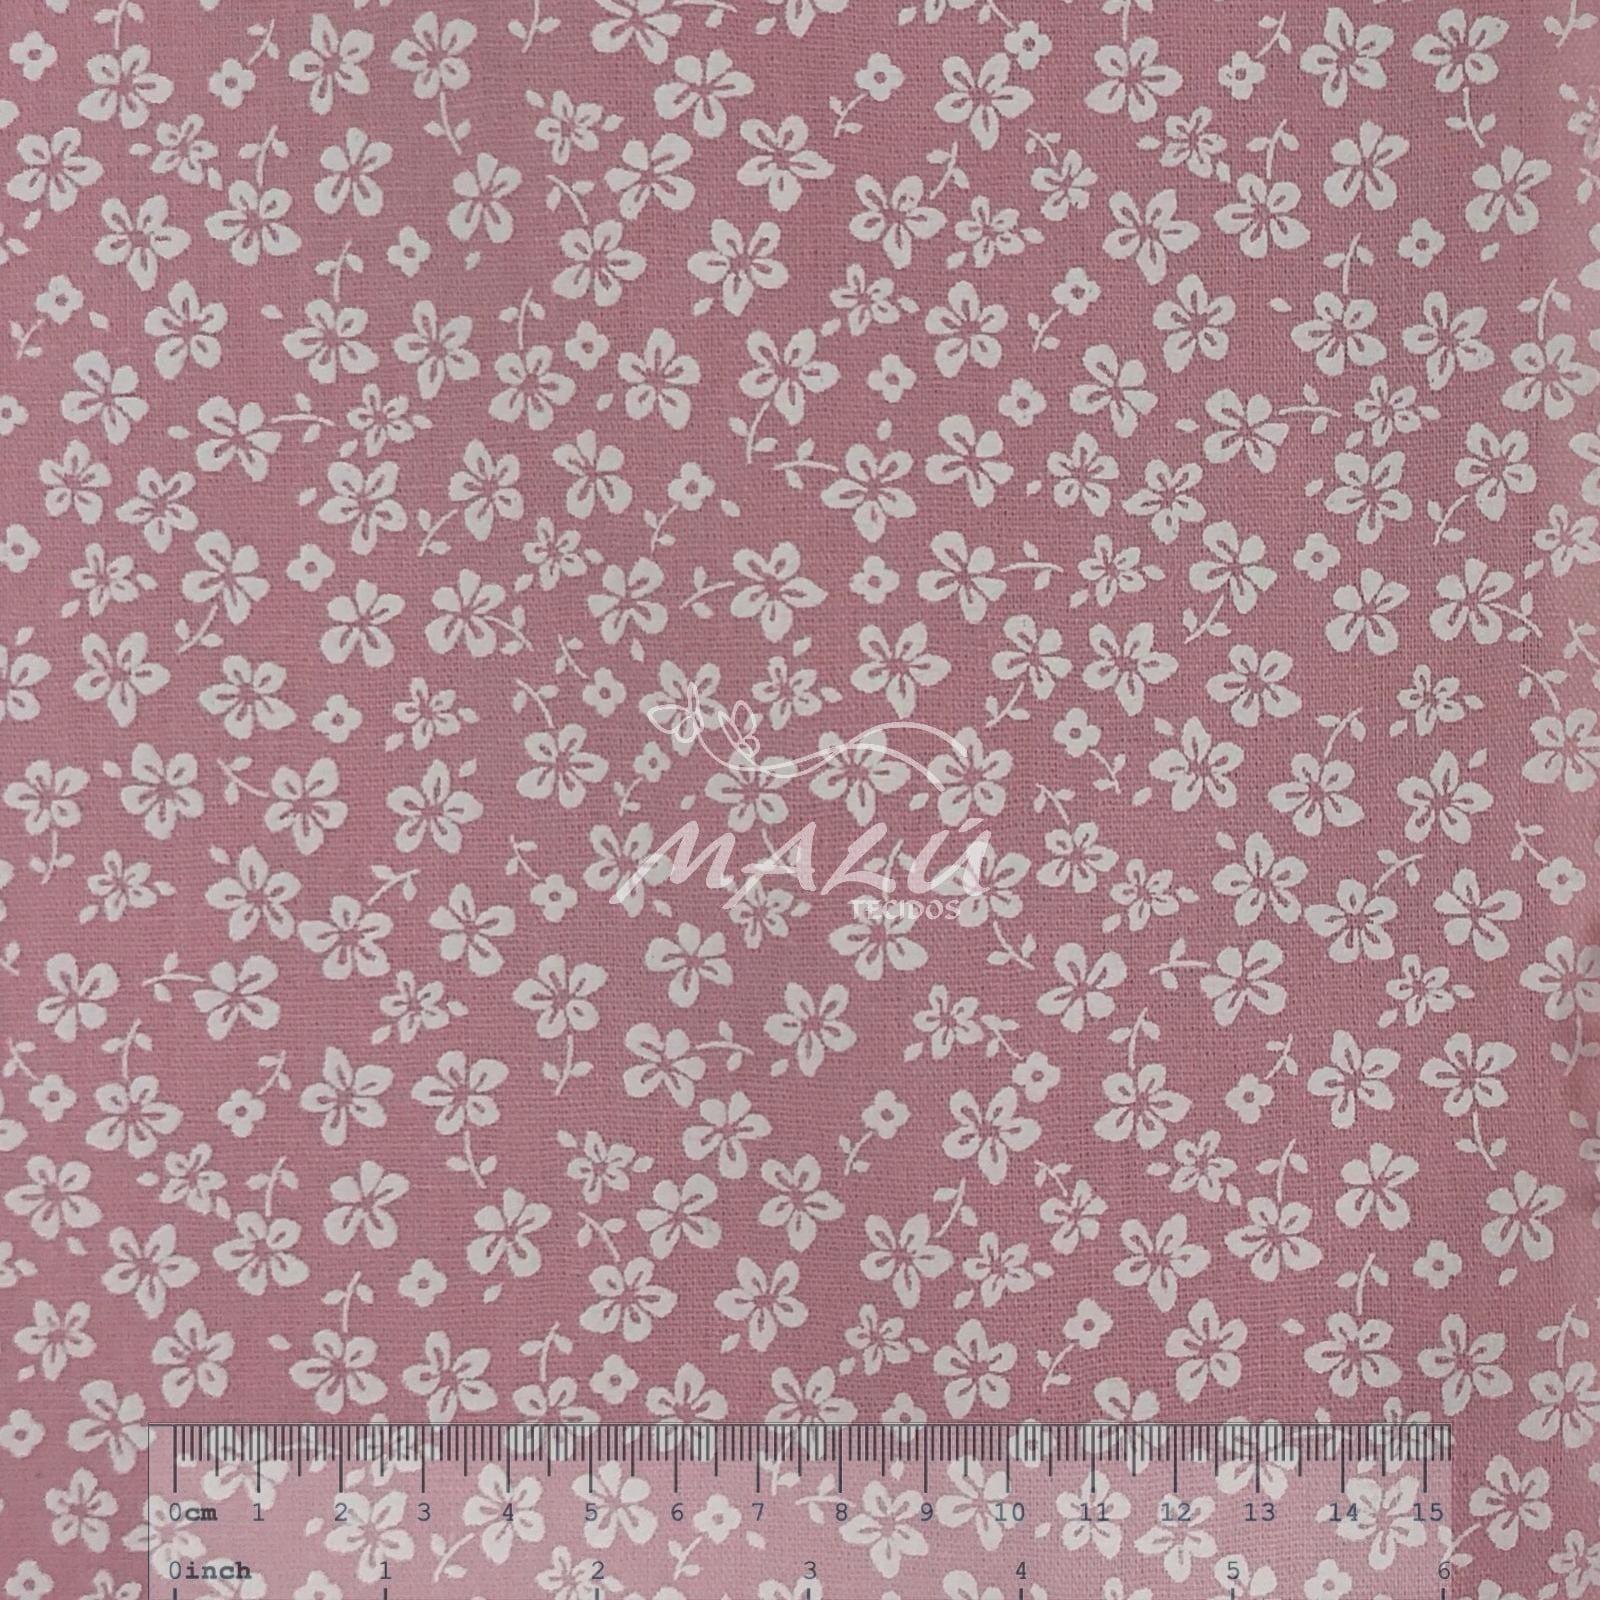 Tricoline Floral Branco com Fundo Rosa Bebe